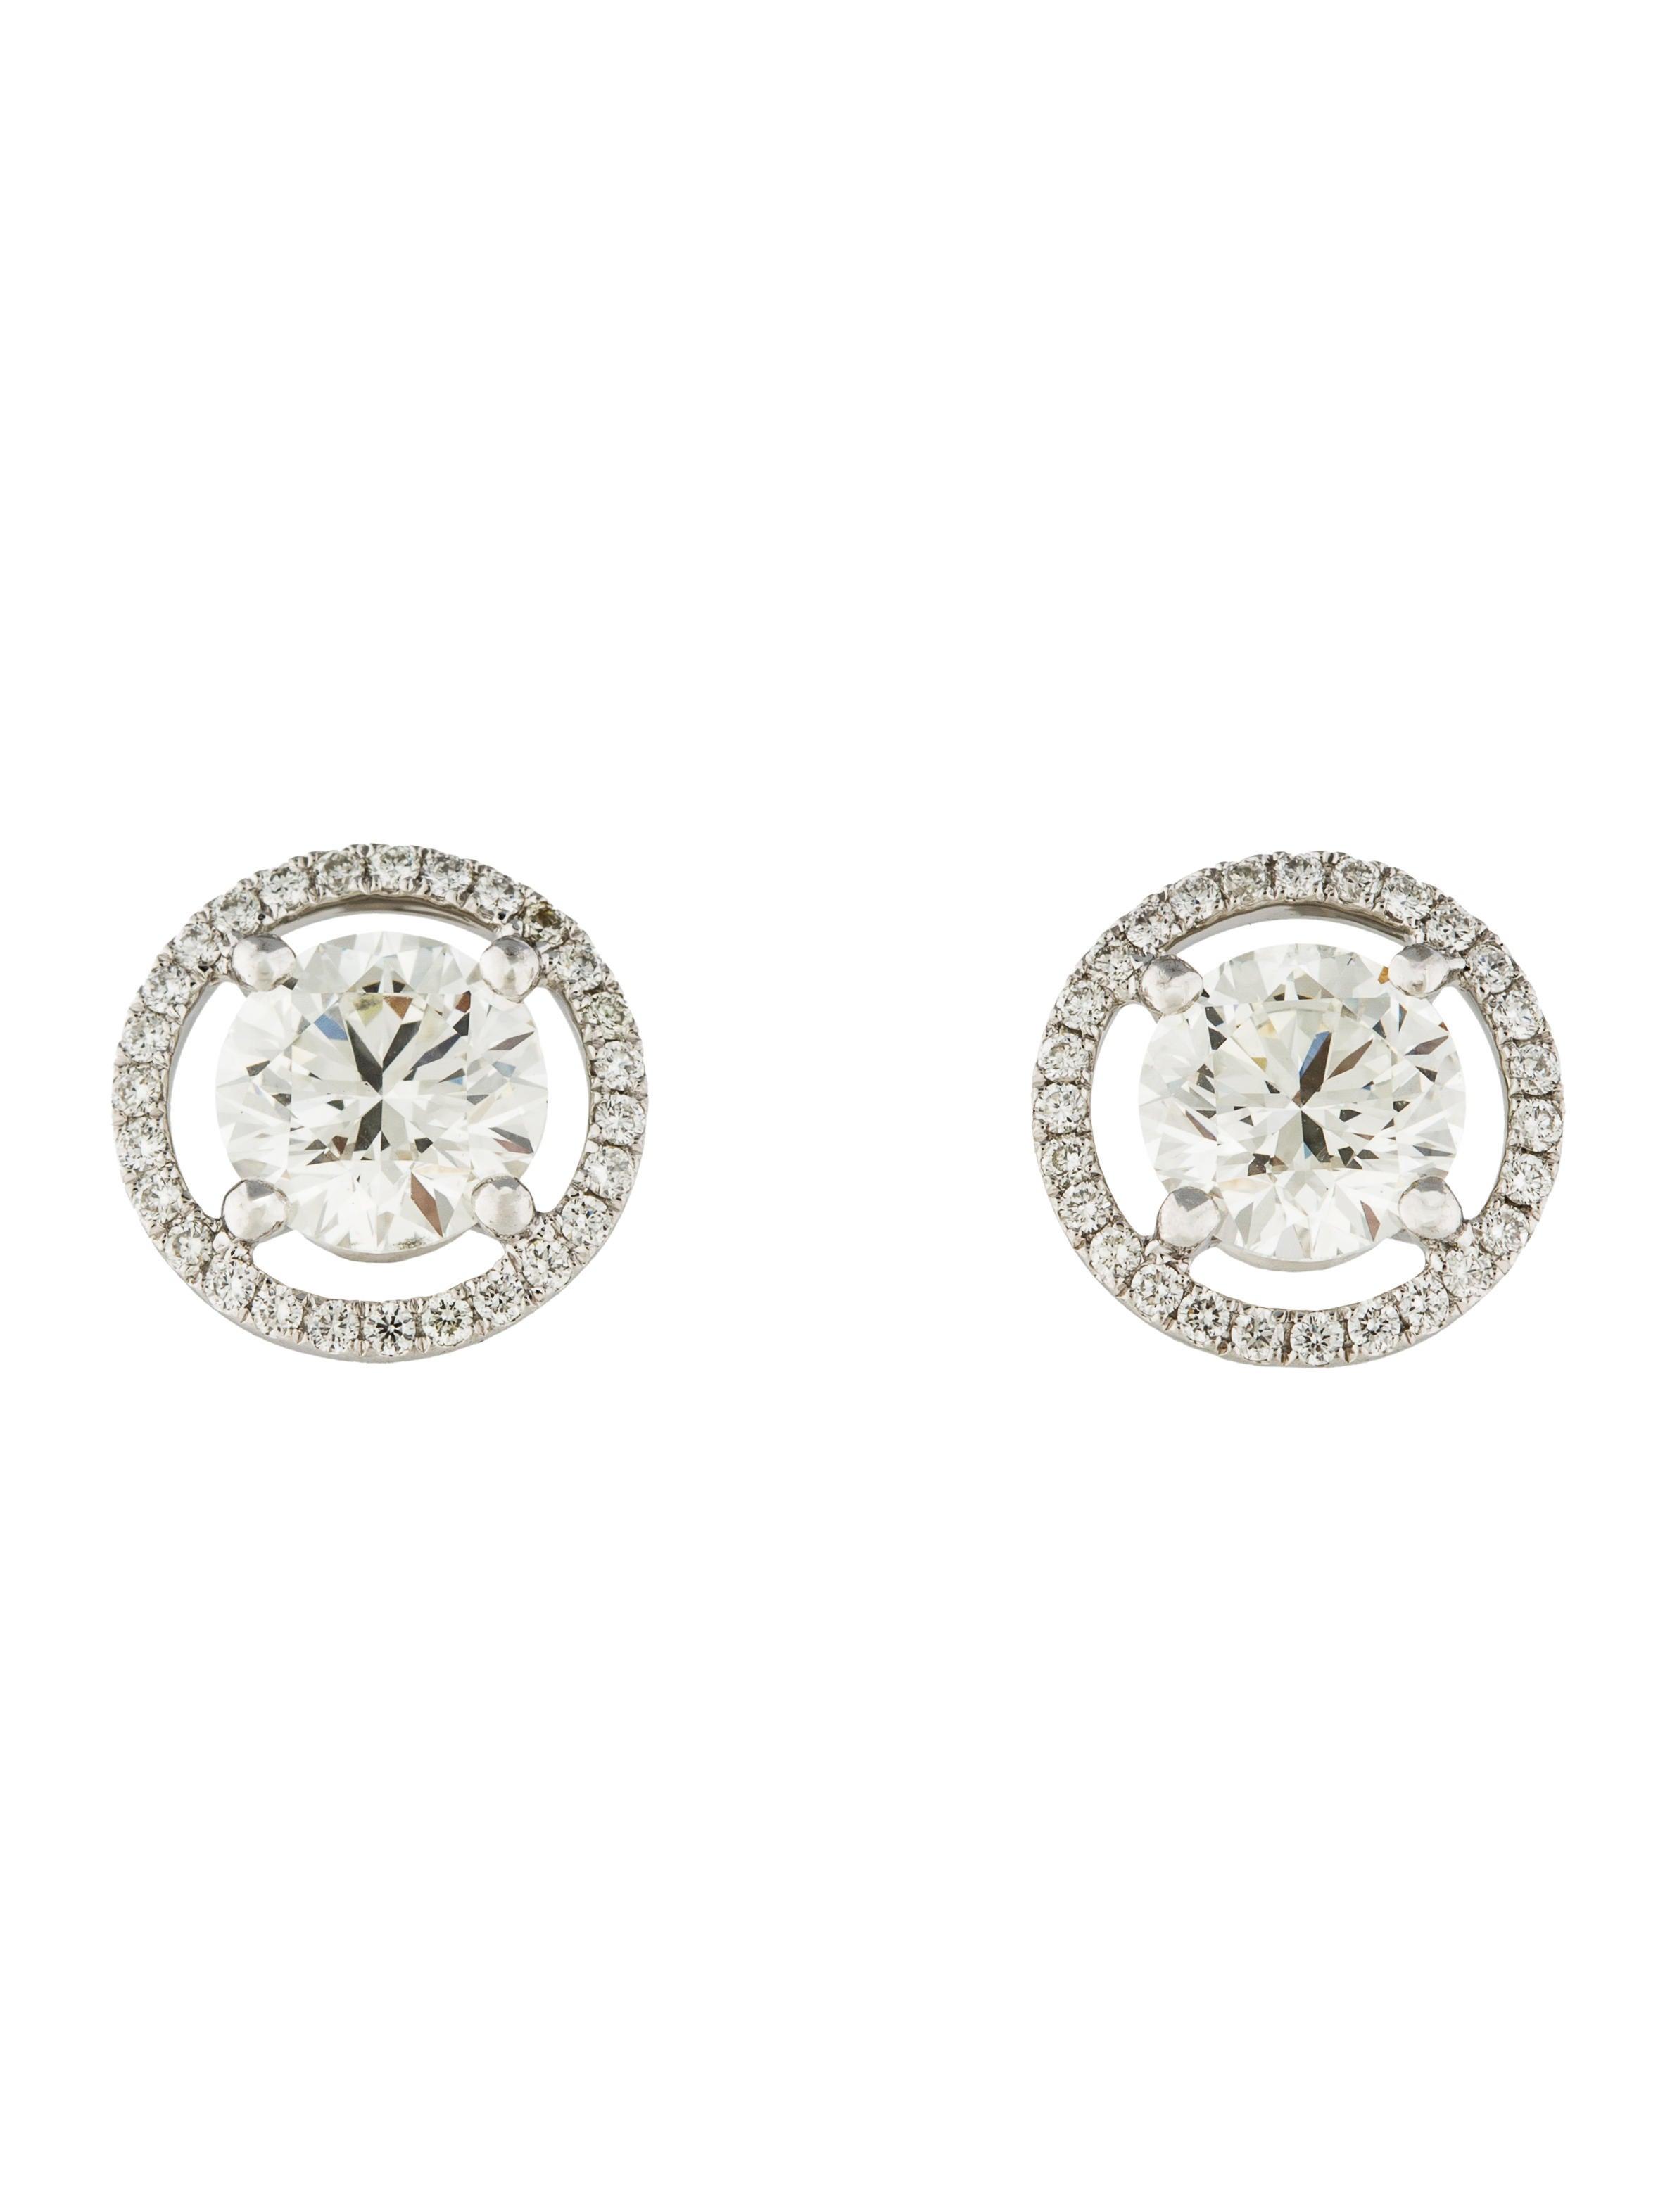 a72983d8a De Beers Aura Diamond Stud Earrings - Earrings - DEB20050 | The RealReal